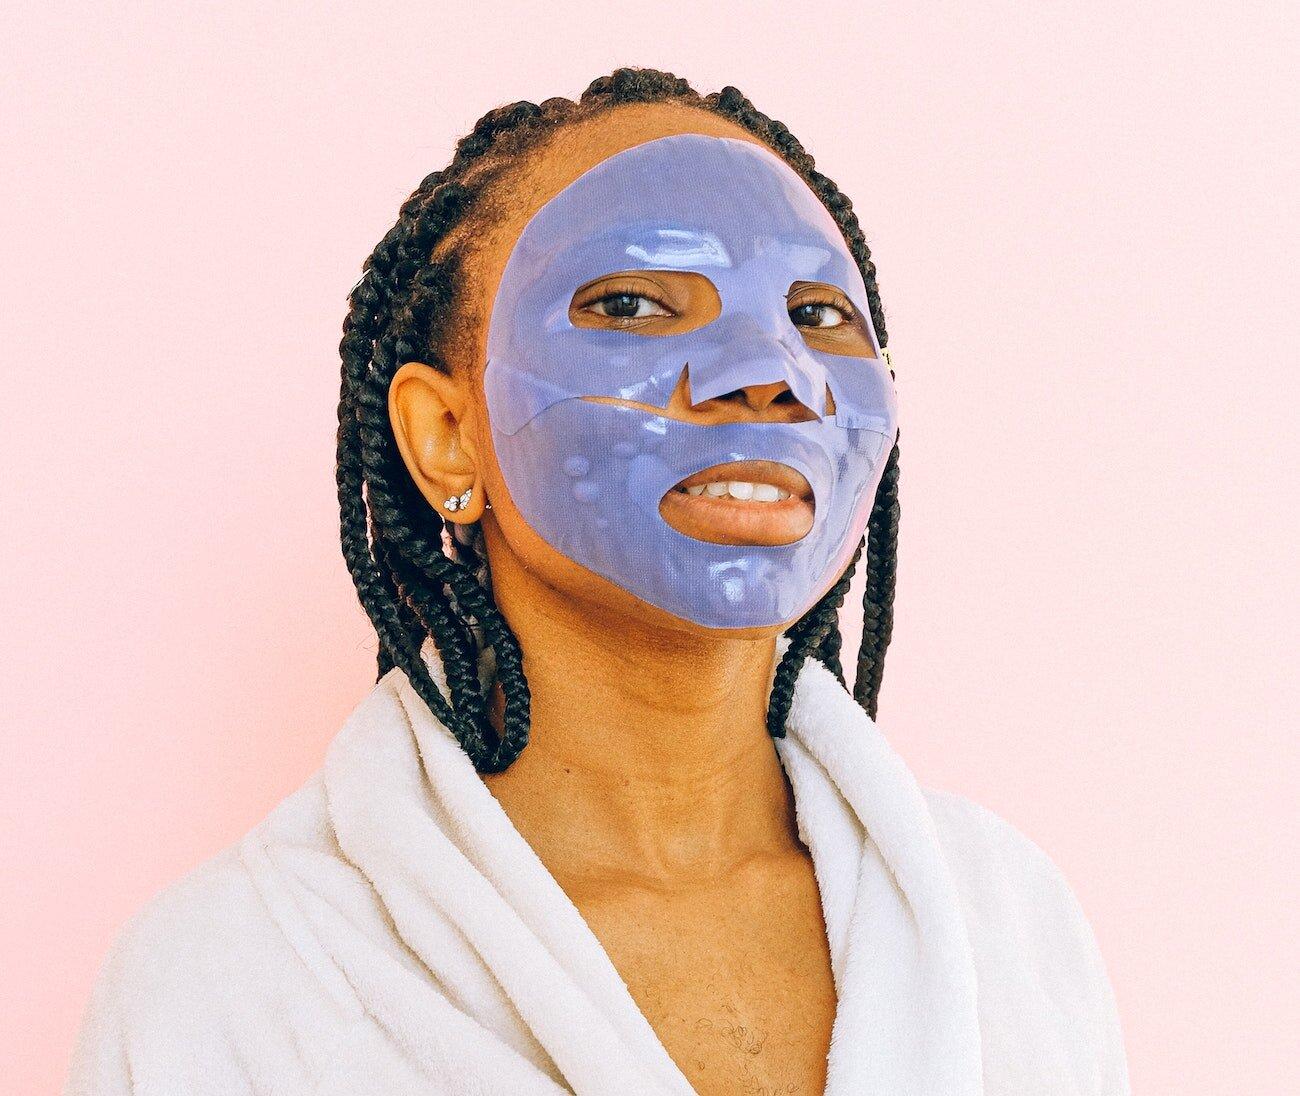 Black women invisible in skincare pic 2.jpg